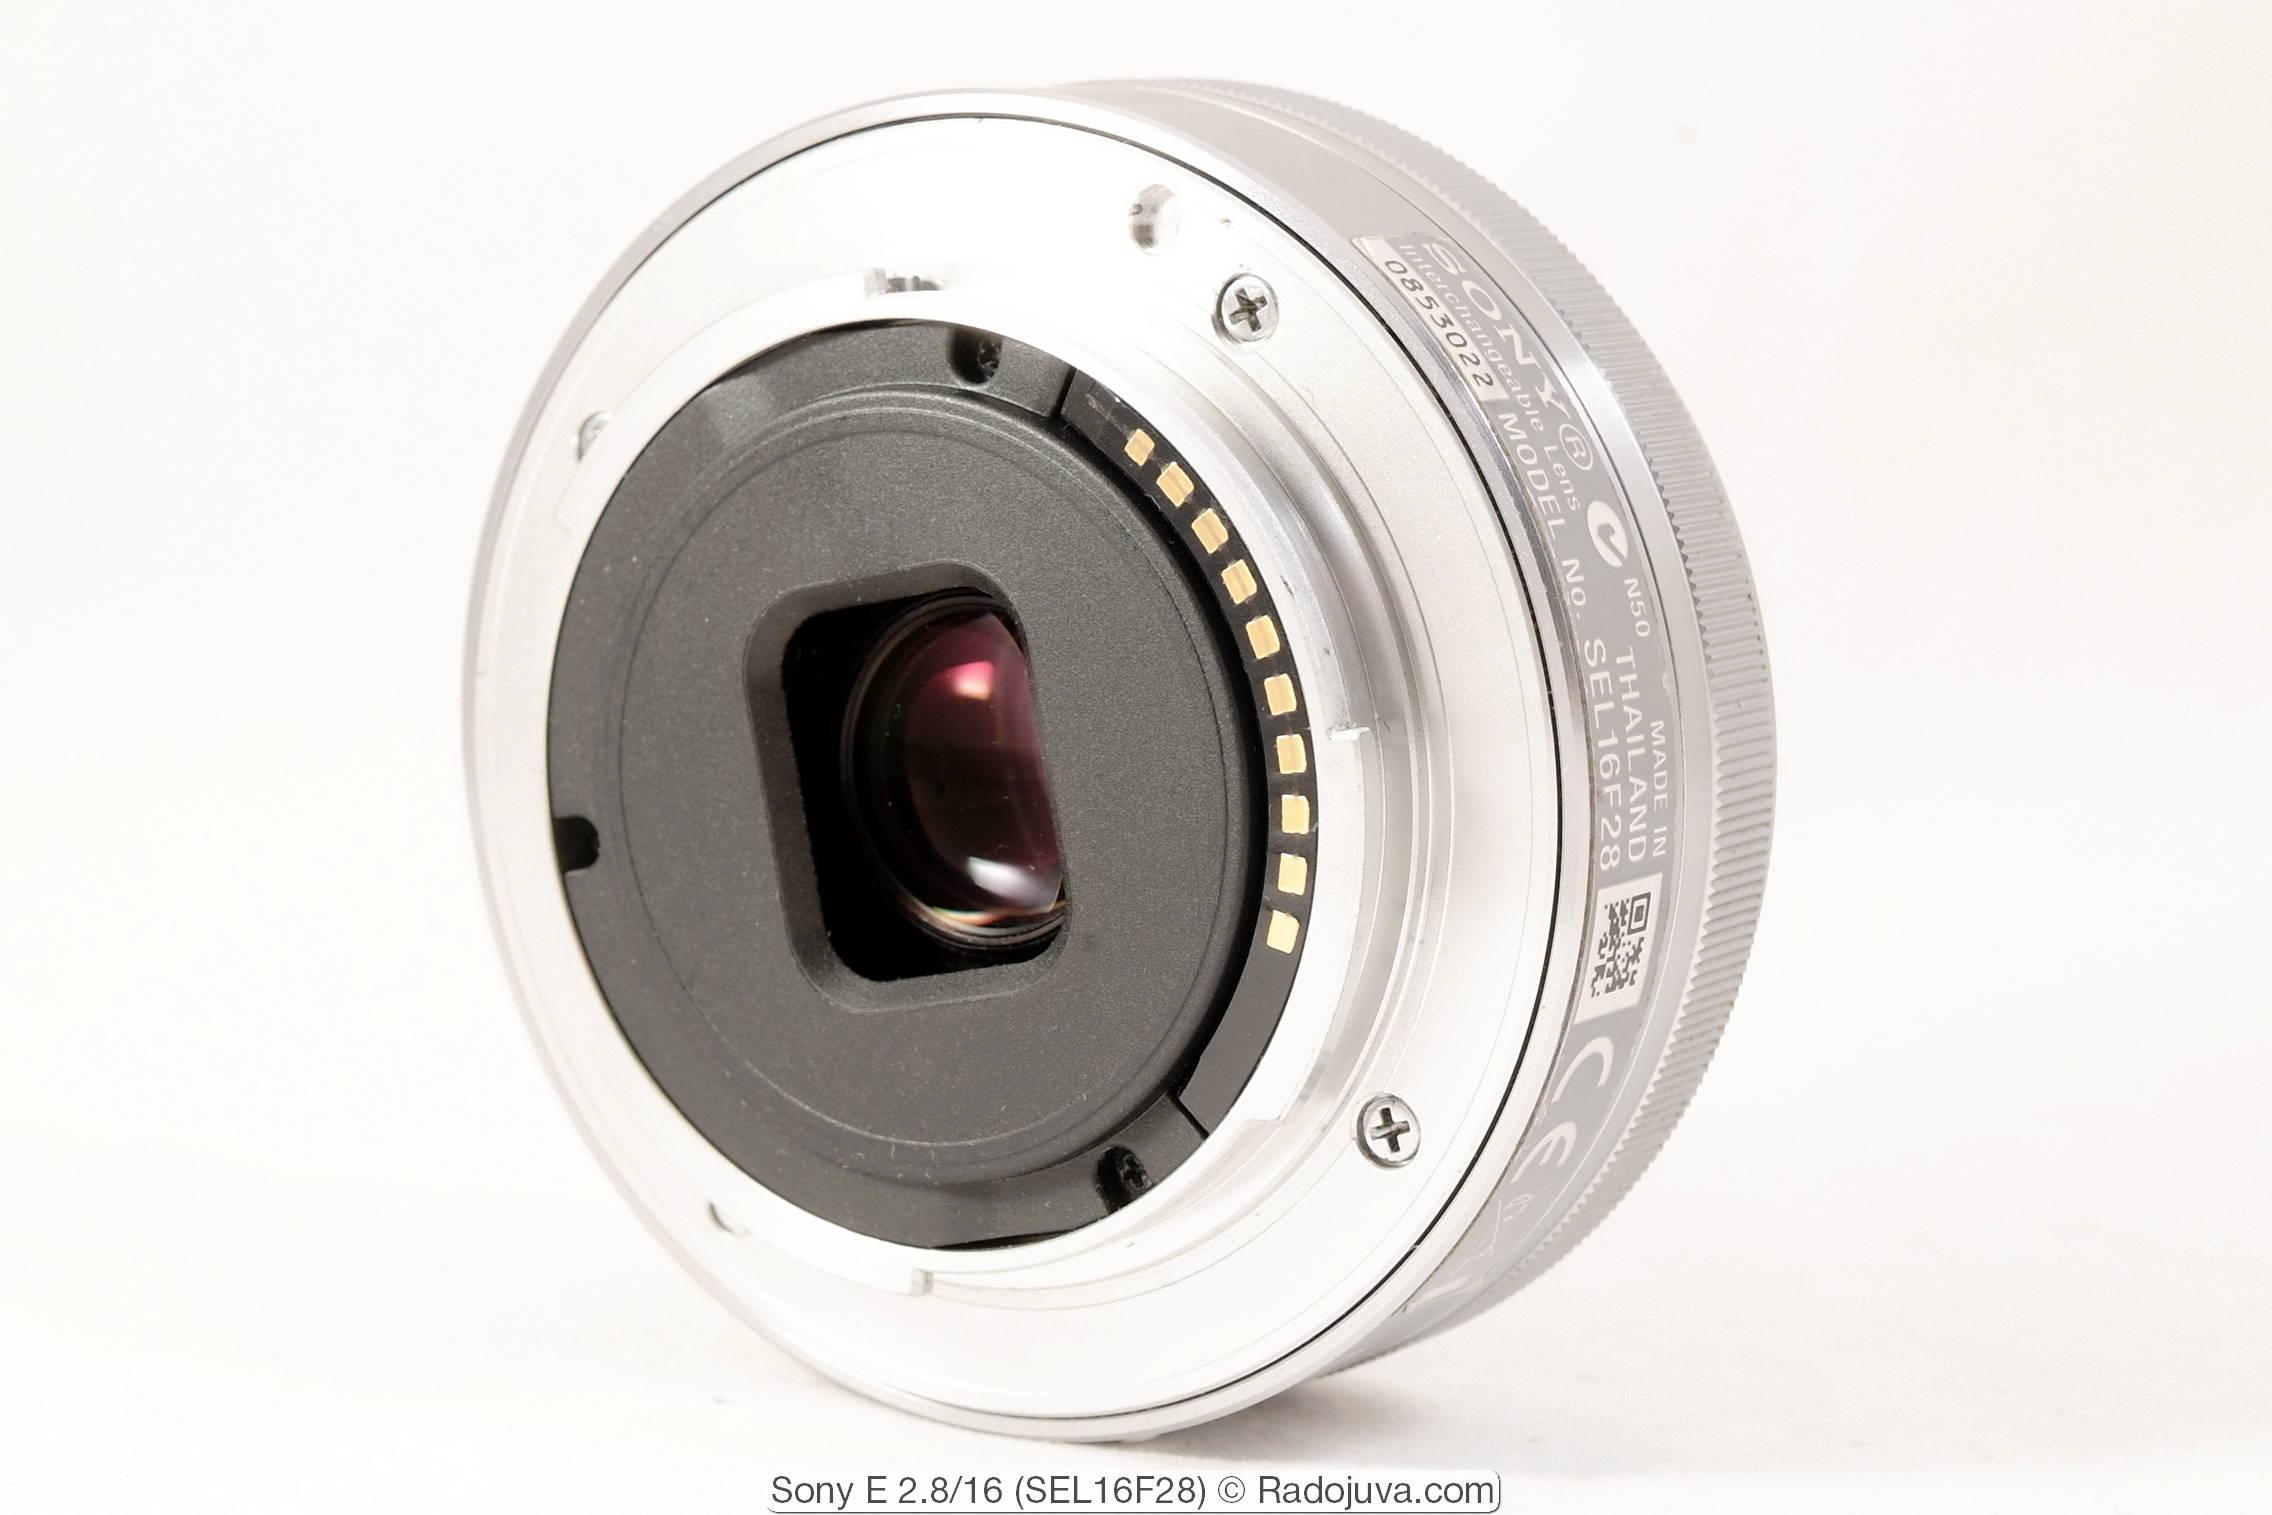 Sony E 2.8/16 (SEL16F28)